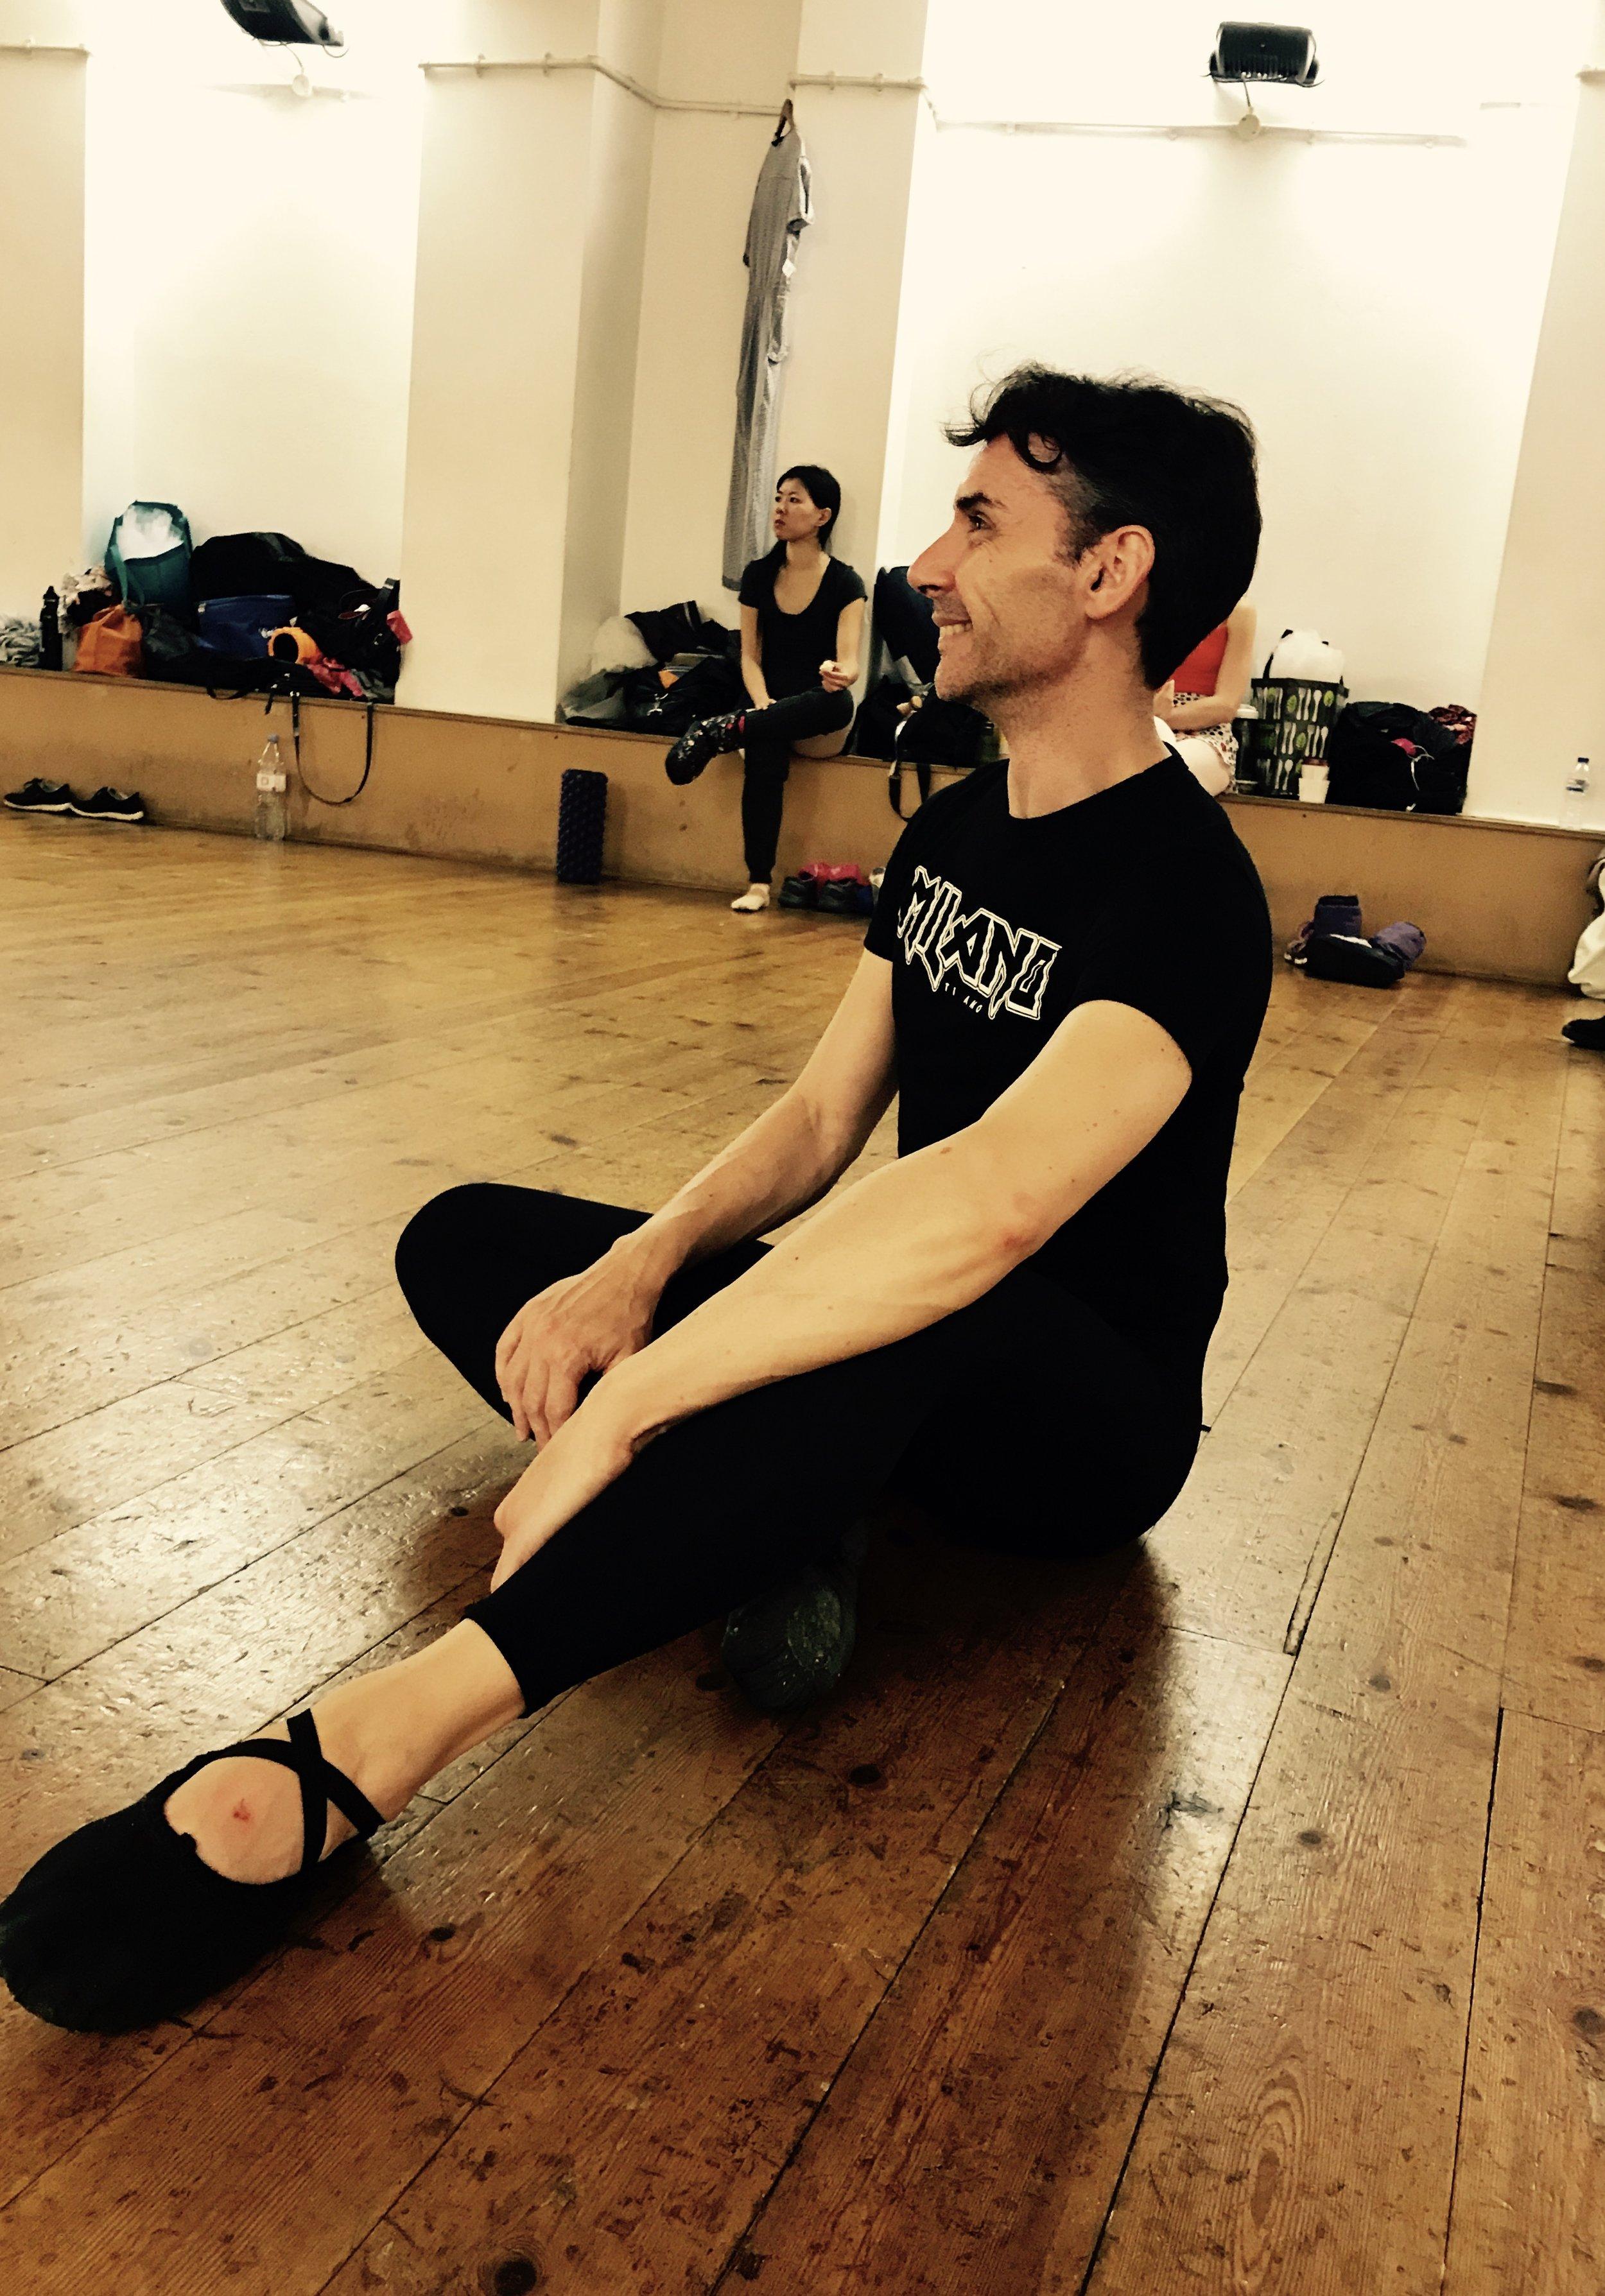 Tony in an all black ensemble.  Ballet shoes -  http://uk.blochworld.com